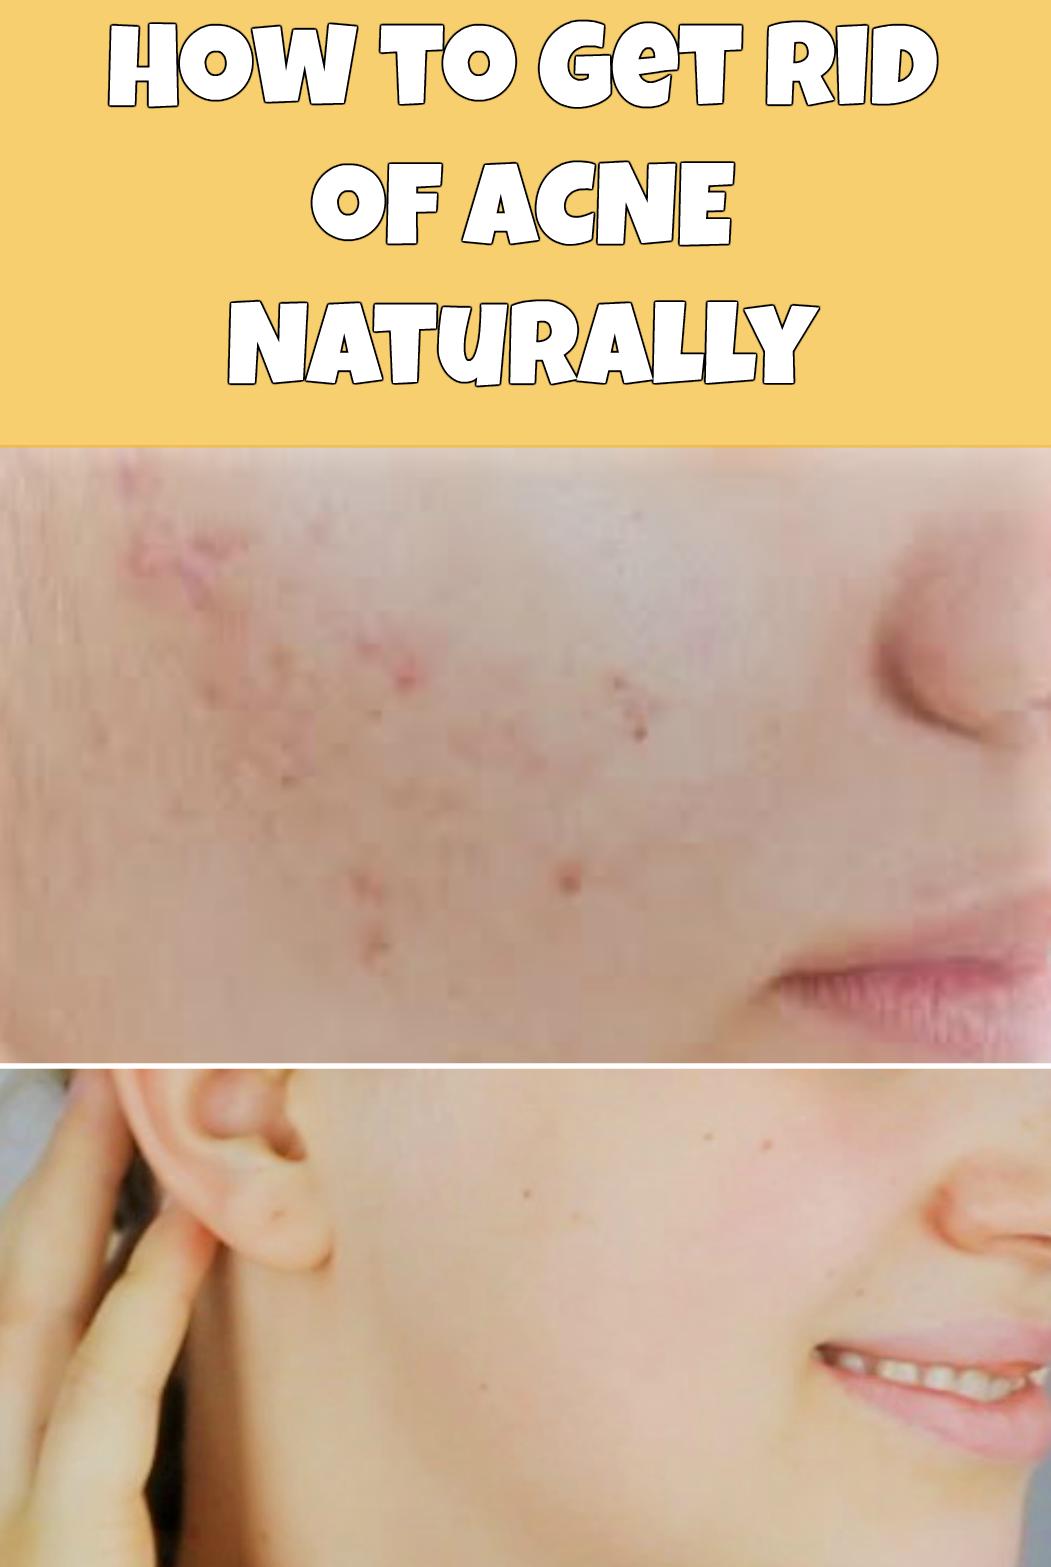 How to get rid of acne naturally diy do it yourself homemade homemade face masks solutioingenieria Choice Image